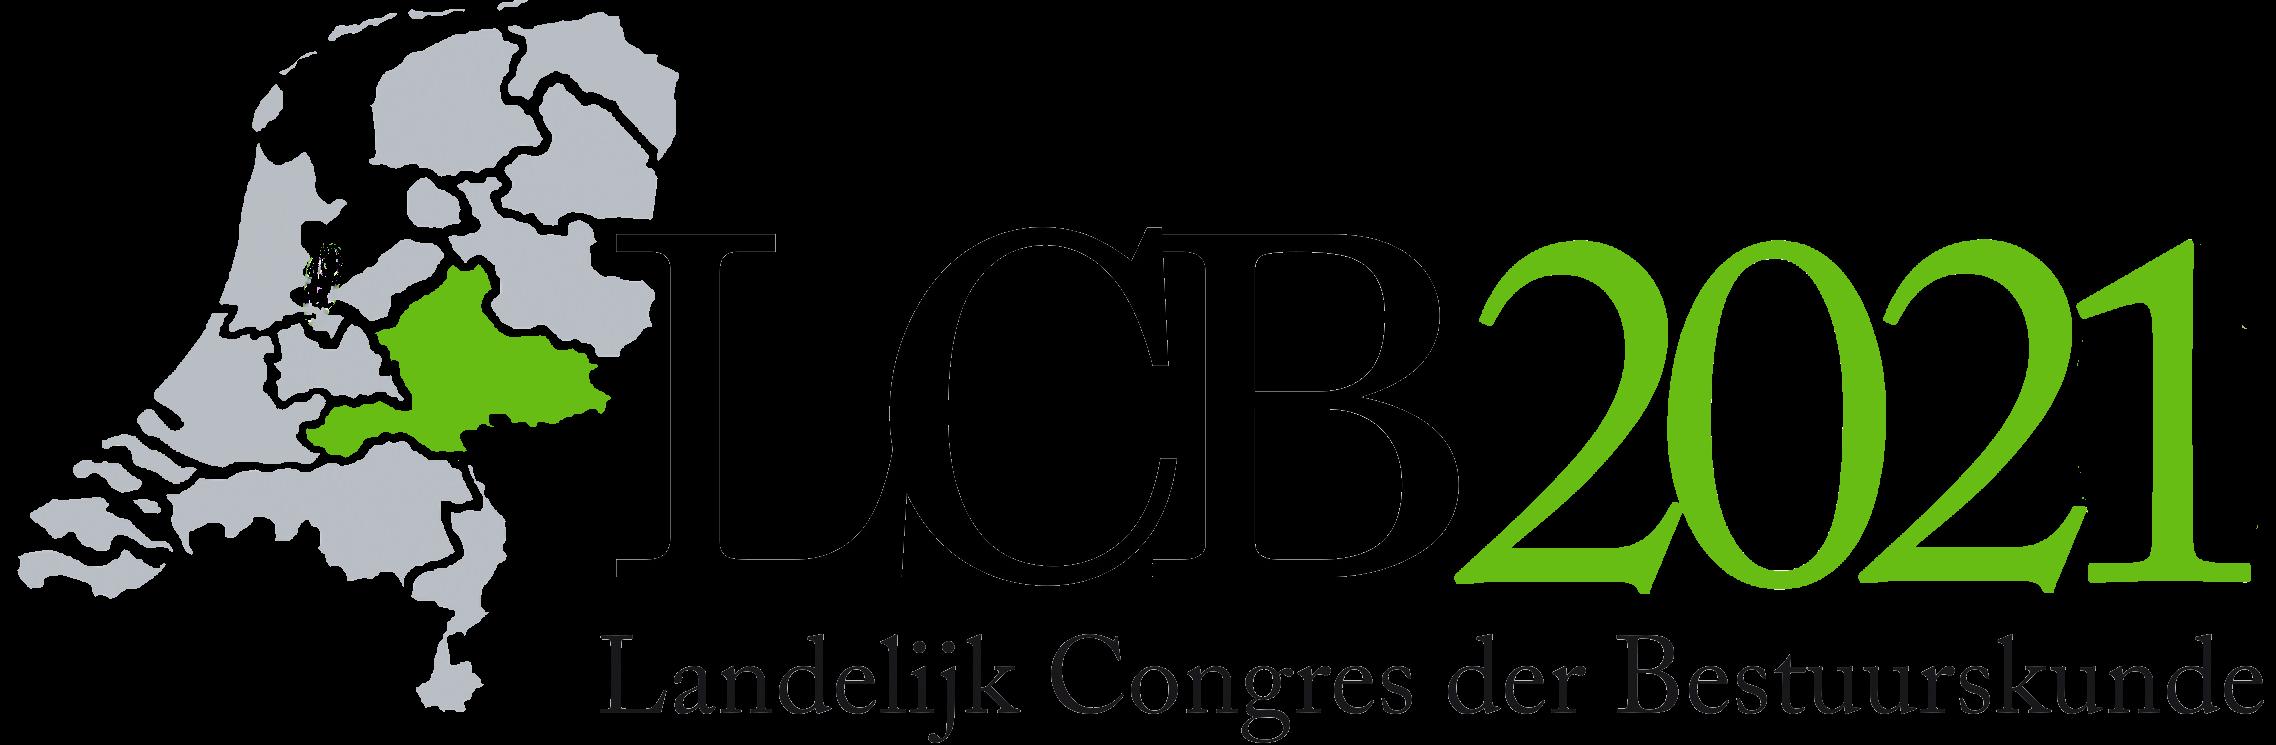 Landelijk Congres der Bestuurskunde (LCB) 2021